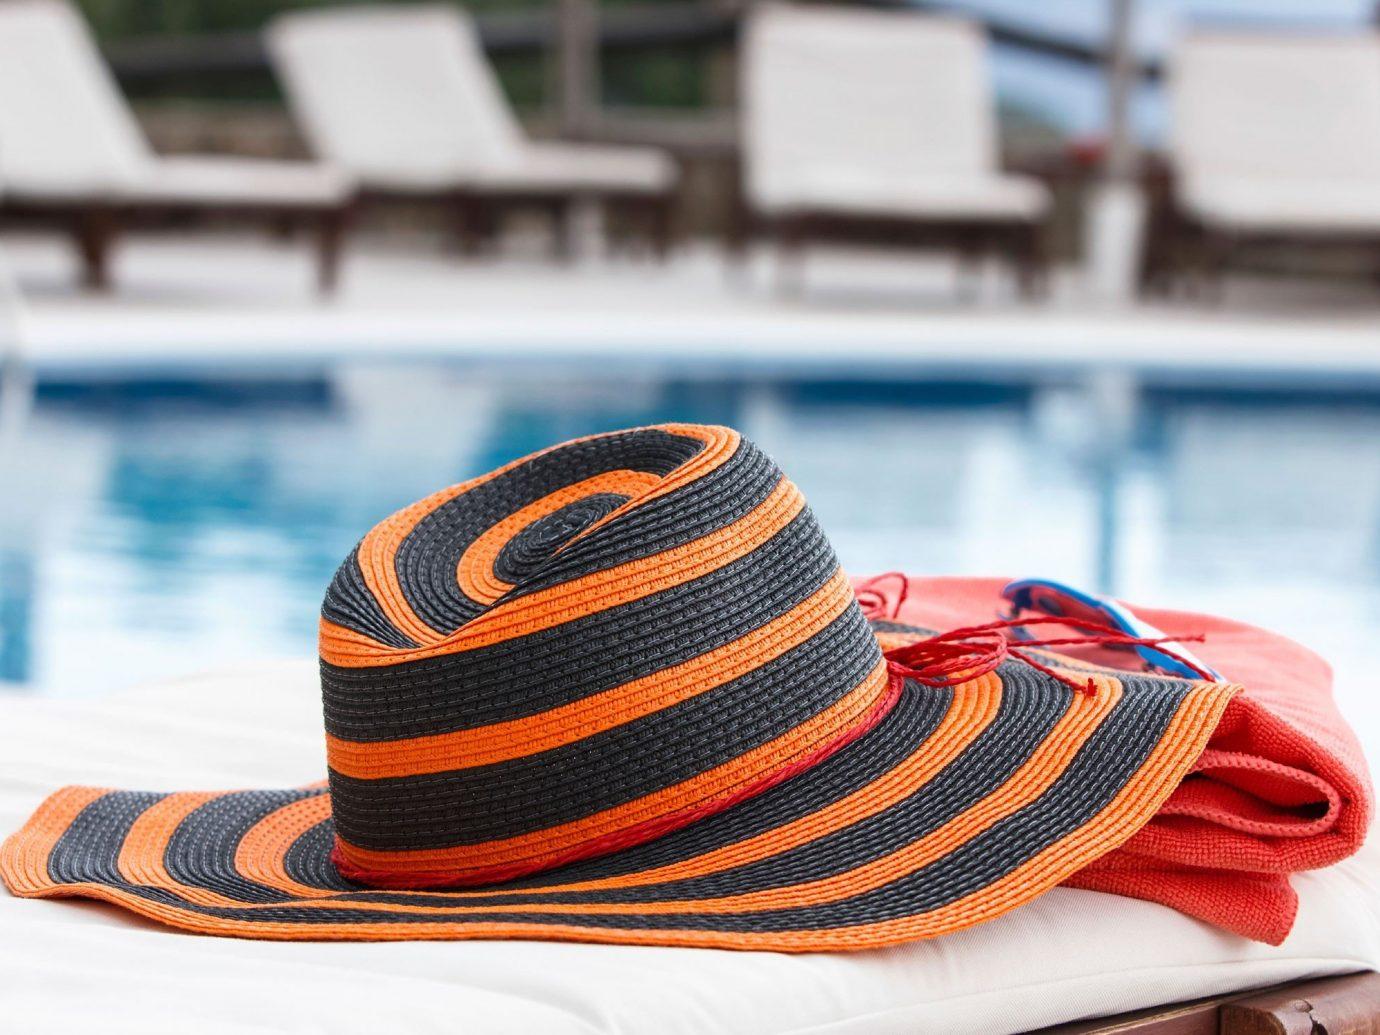 Hotels clothing outdoor person cap hat fashion accessory fedora headgear Design striped pattern orange